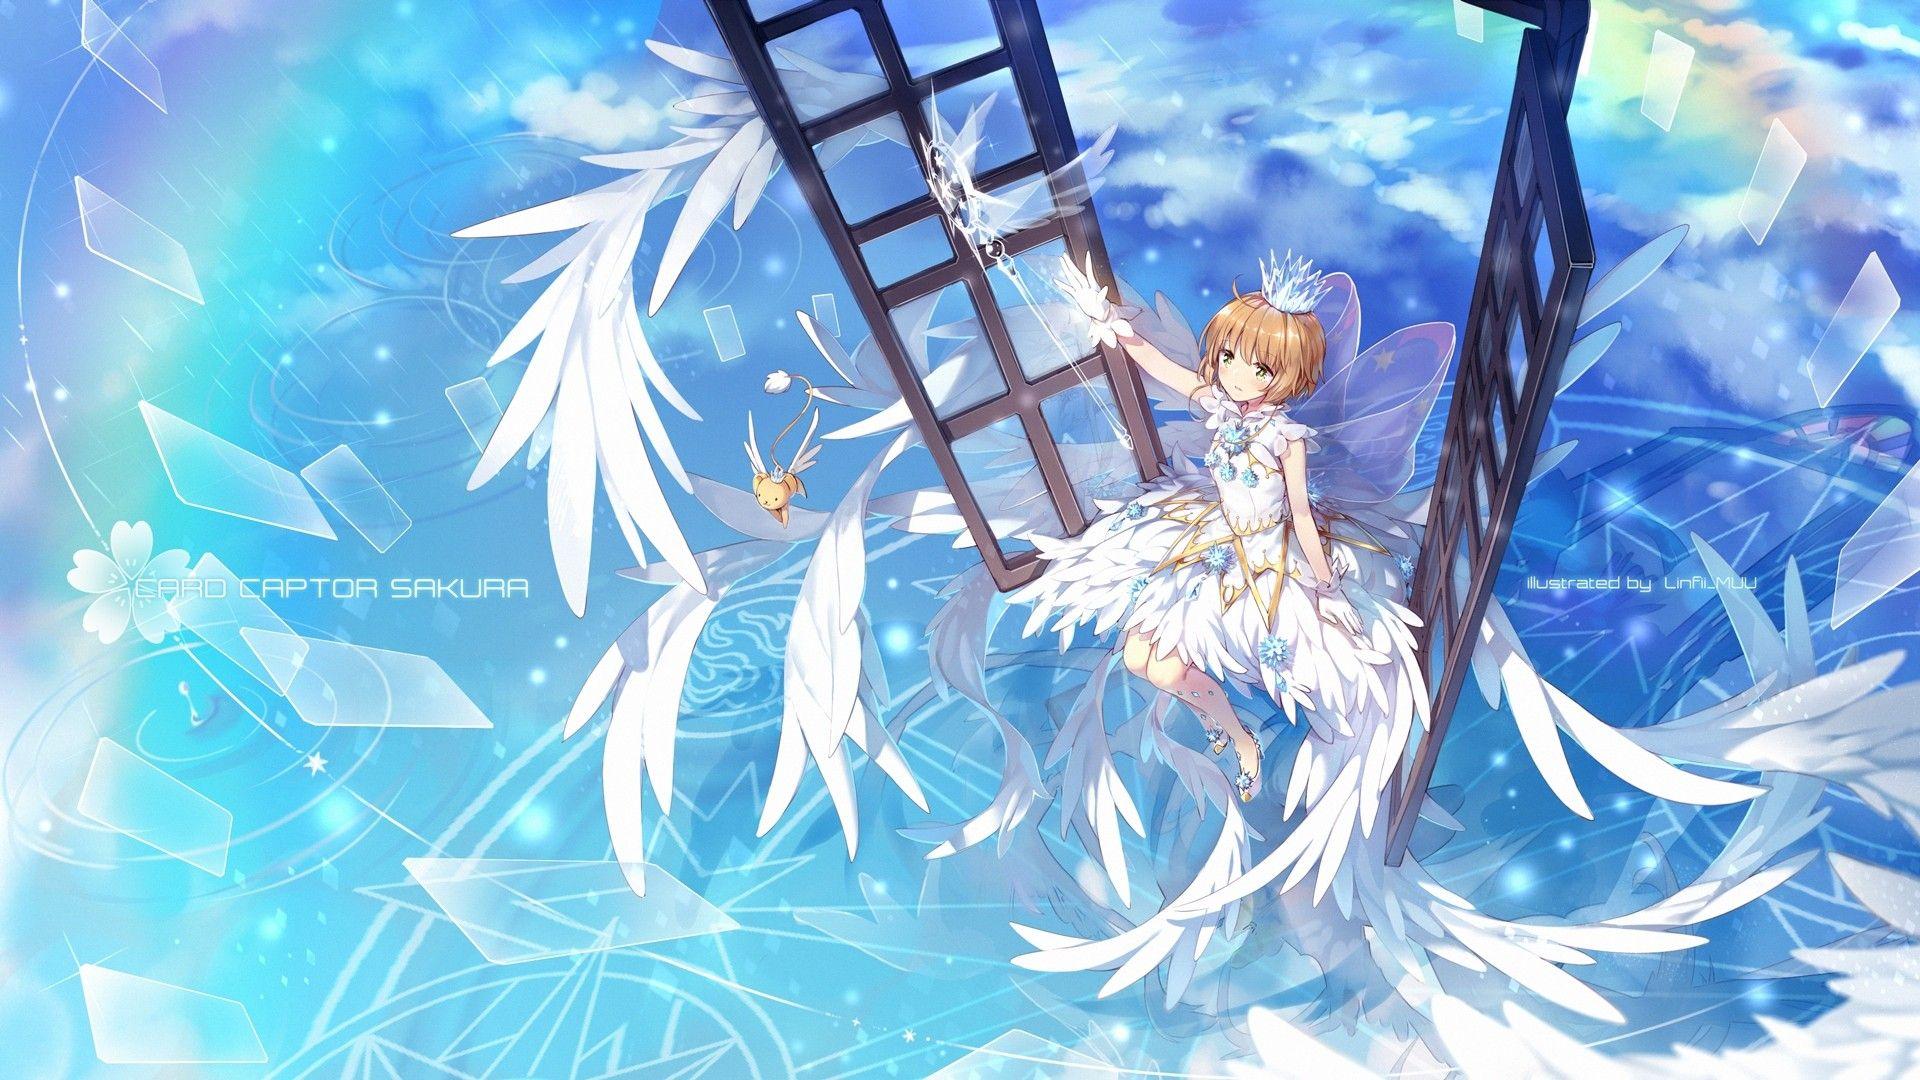 Kinomoto Sakura Cardcaptor Sakura Clear Card Hen Wings White Dress Cardcaptor Sakura Cardcaptor Sakura